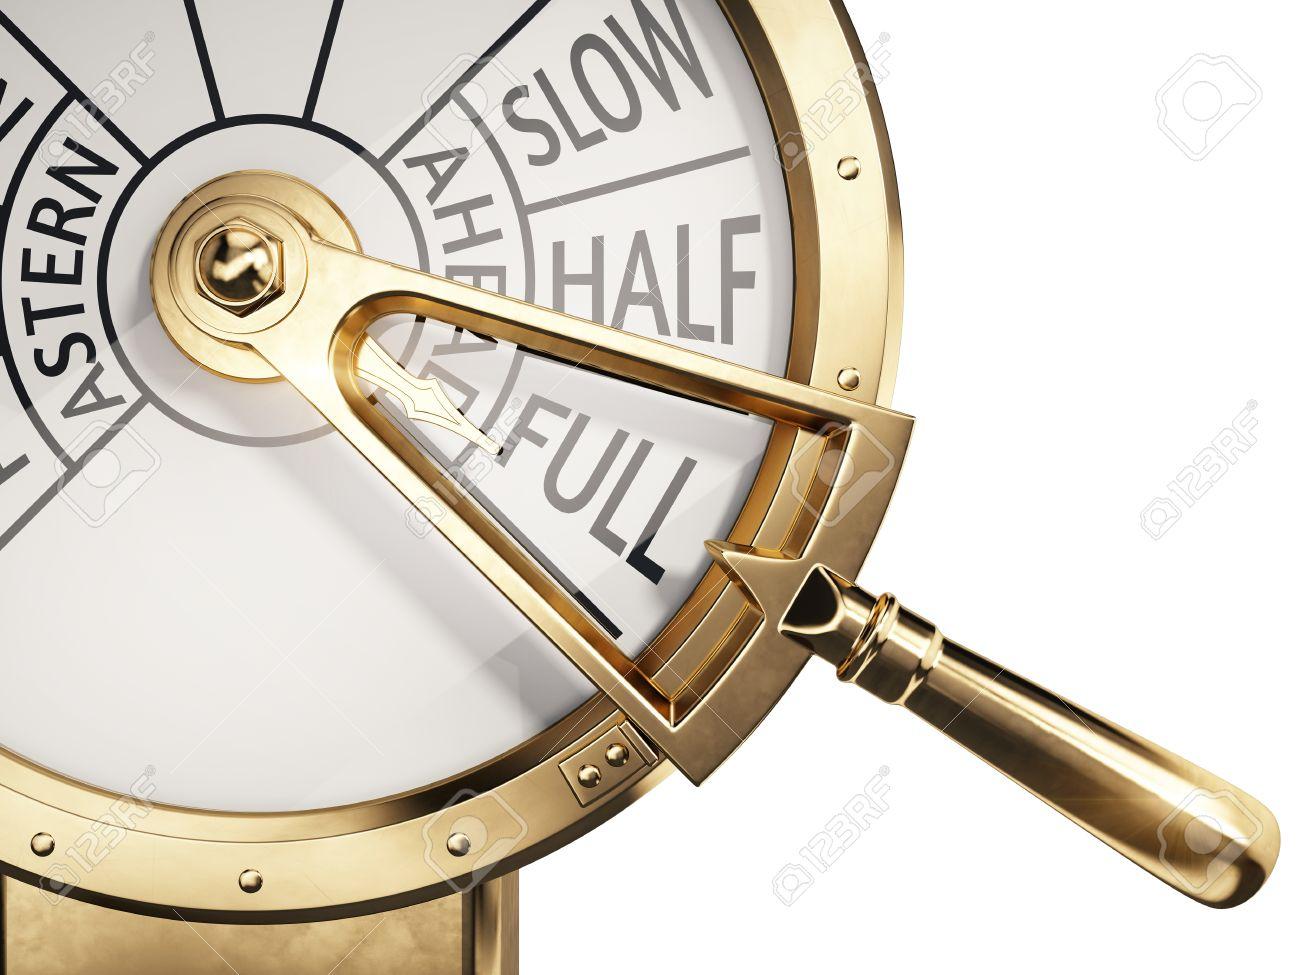 Full Ahead concept - Vintage ships engine room telegraph on full speed ahead - 66293368